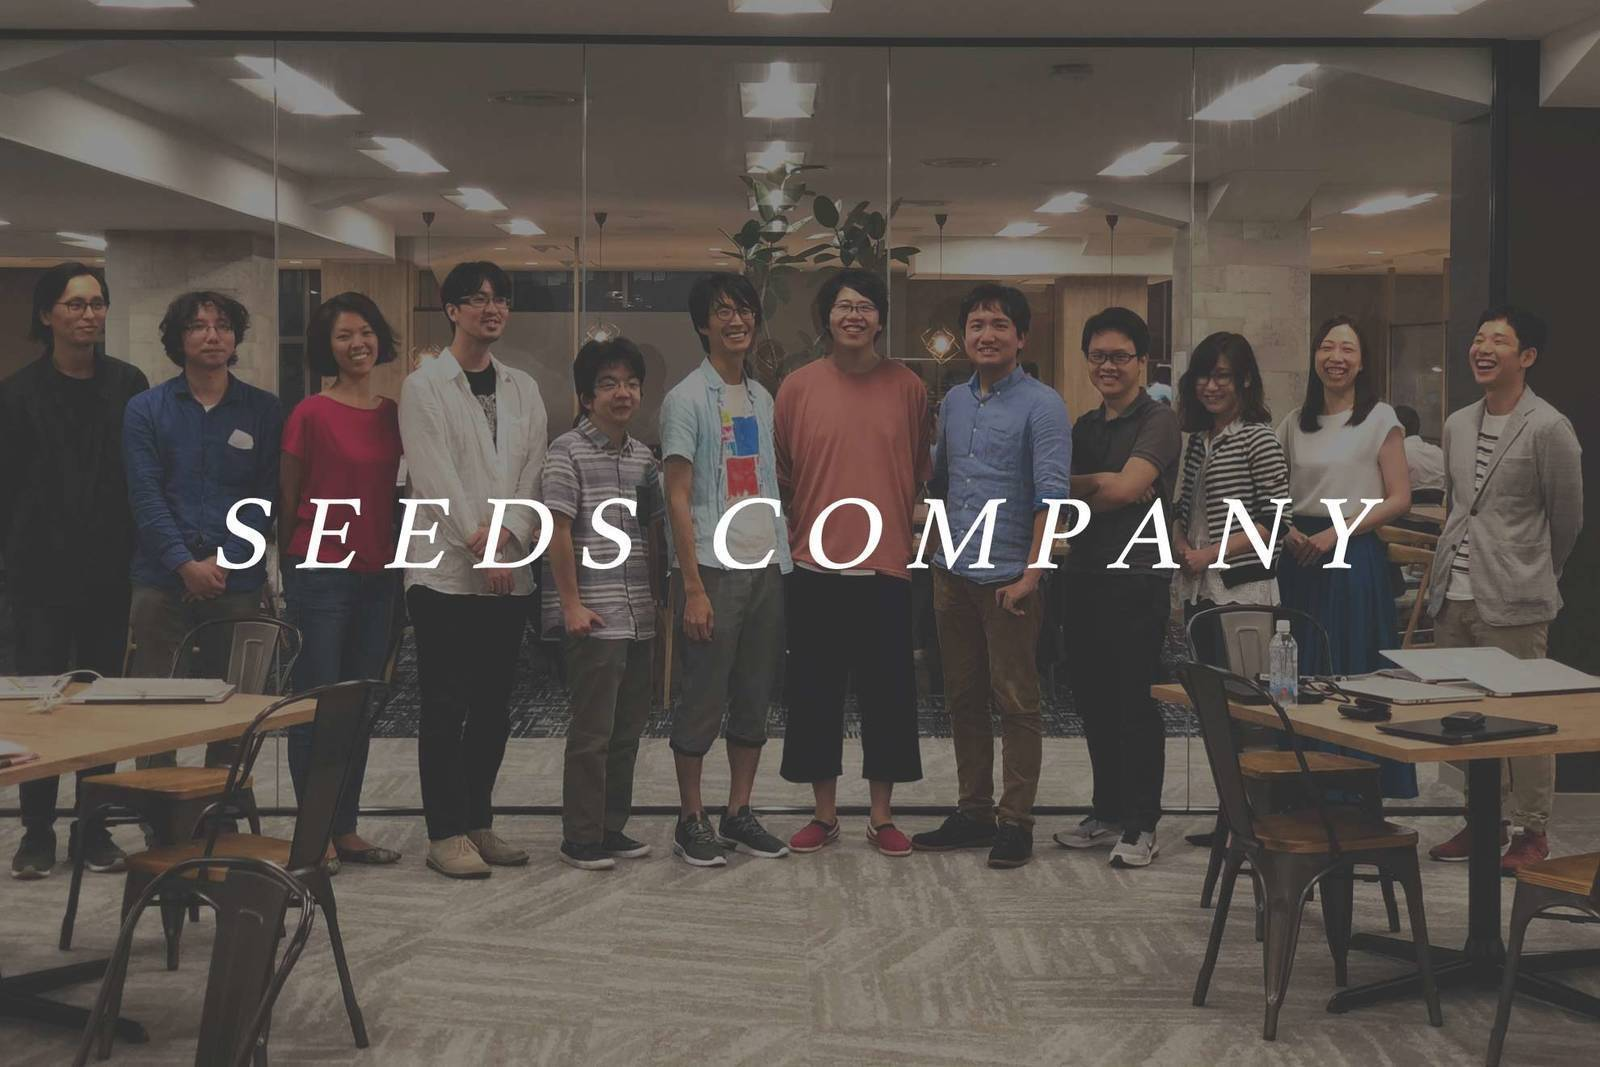 【HR×Tech新規事業】パーソルプロセス&テクノロジー/社内ベンチャー組織の DevOpsチームが Railsエンジニア(リーダー・マネージャー候補)を募集!